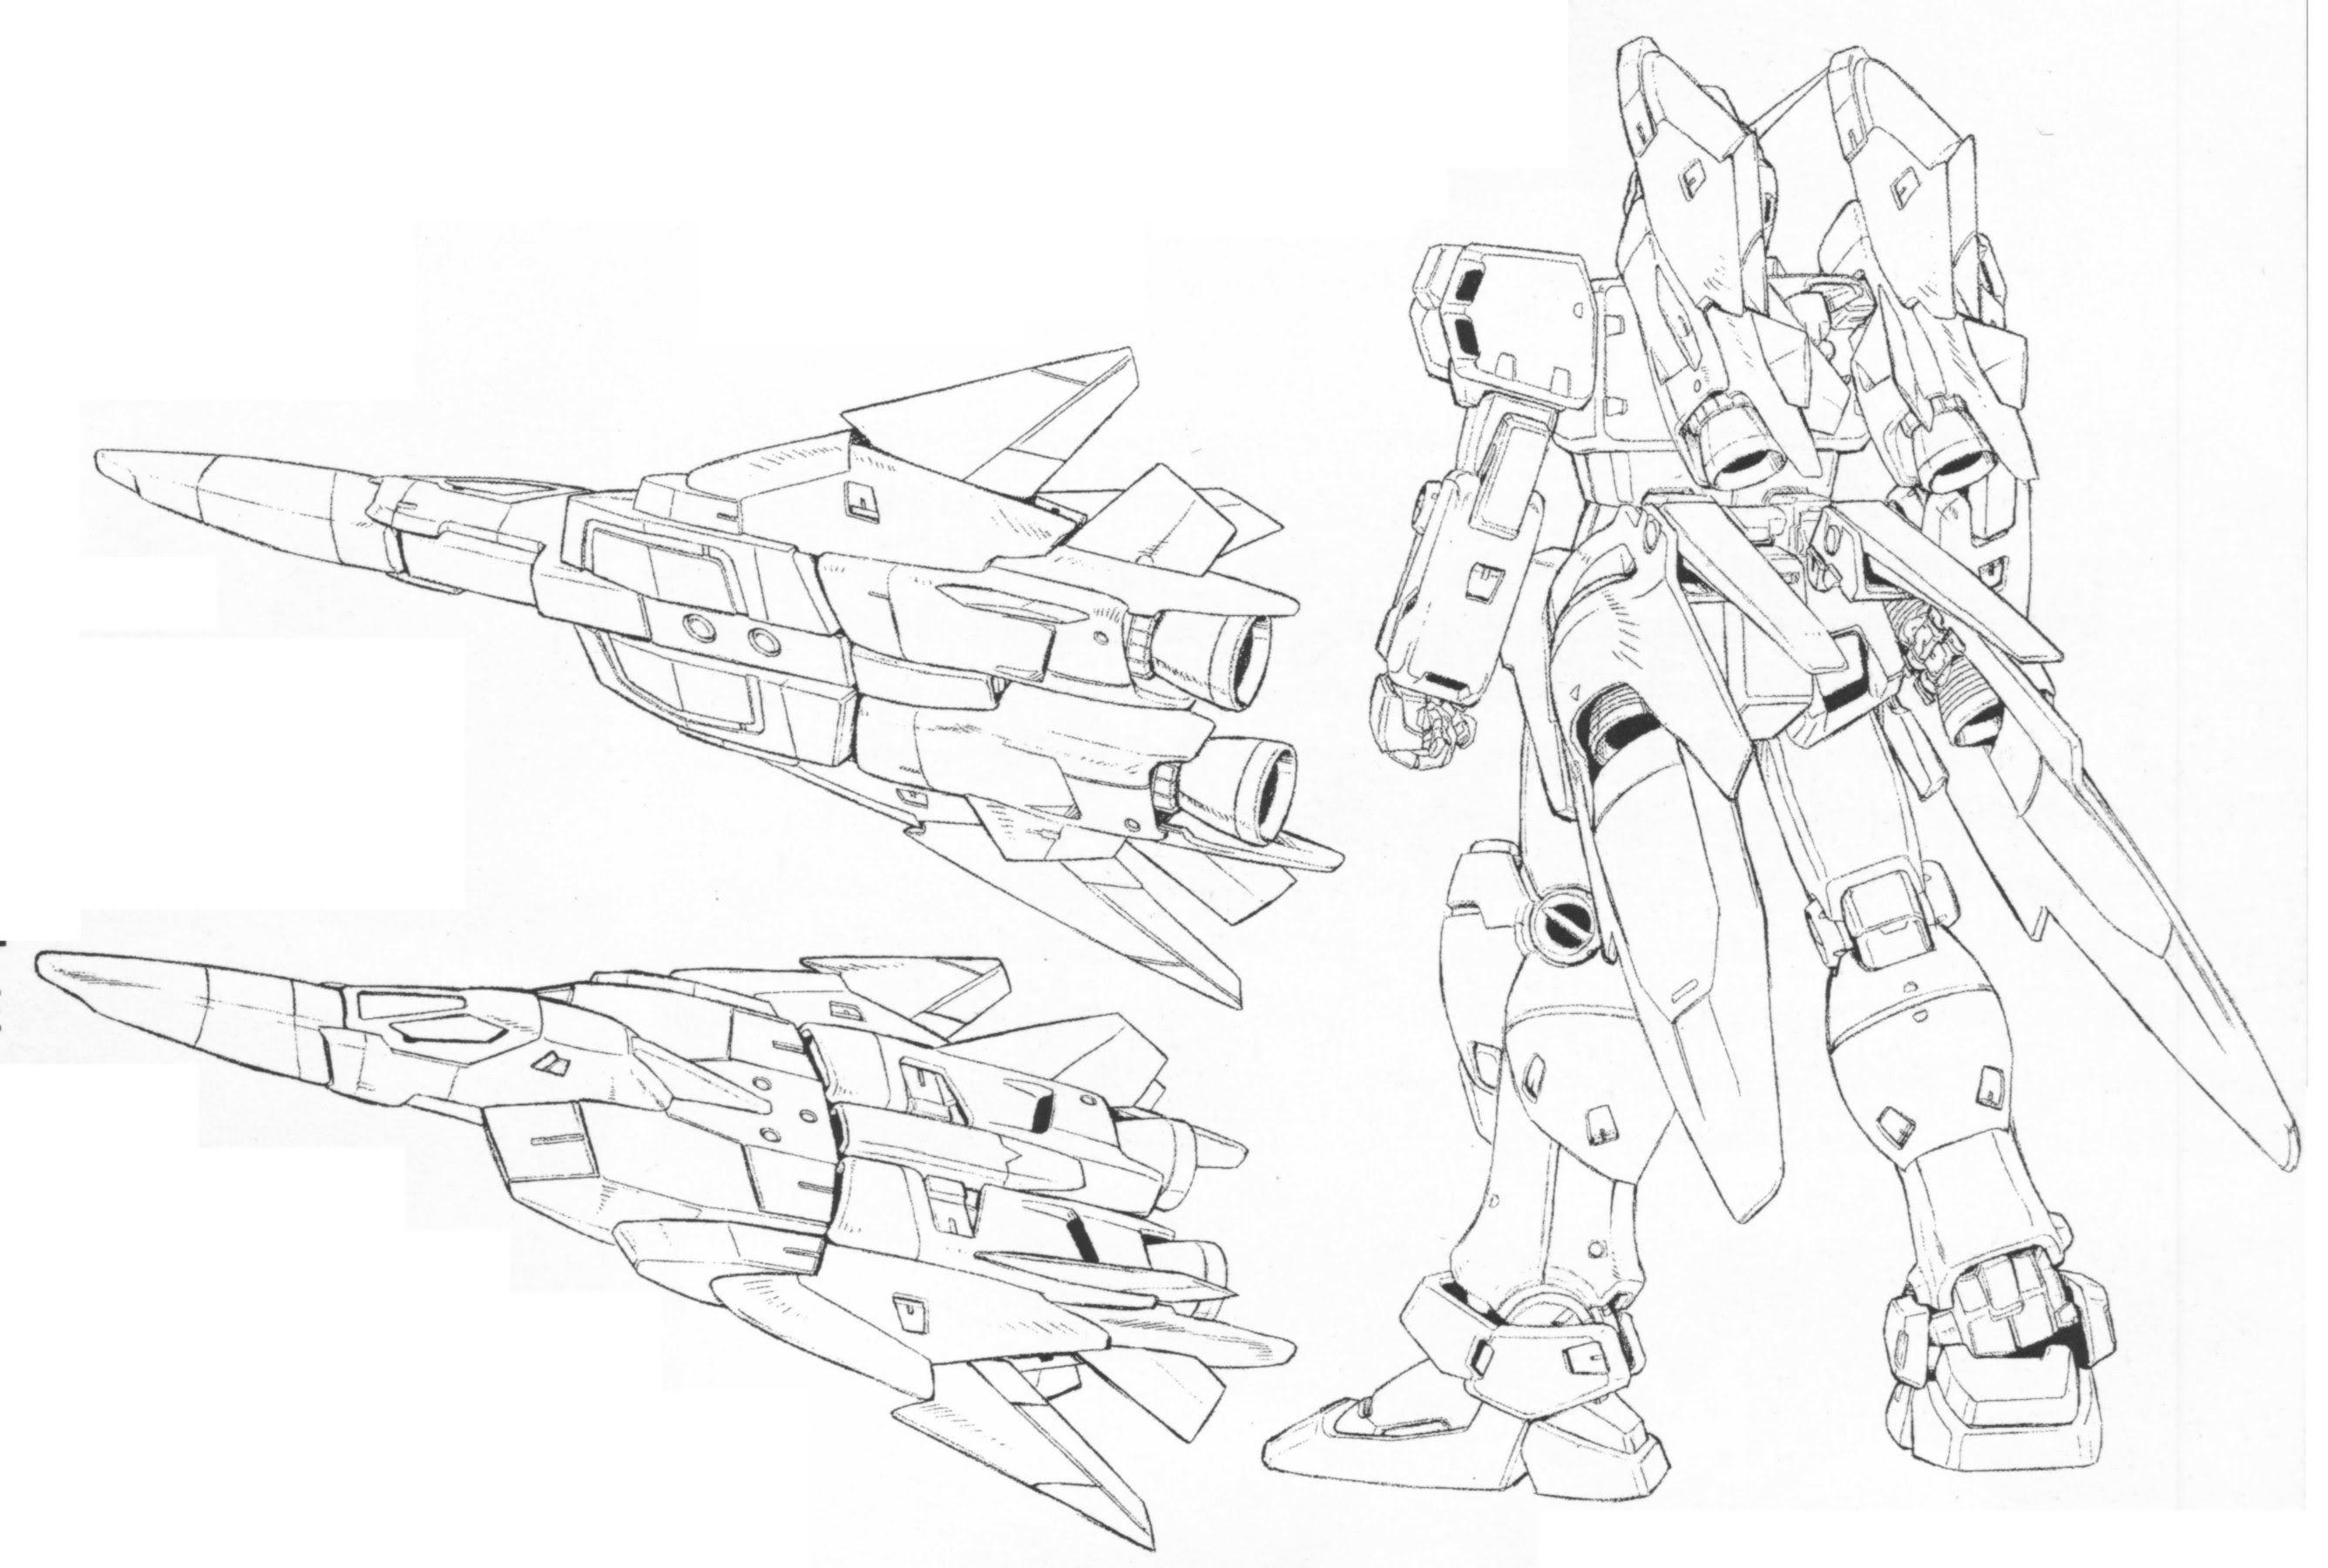 Dendrobium_corefighter2.jpg Photo by goofy_man_JG | Photobucket